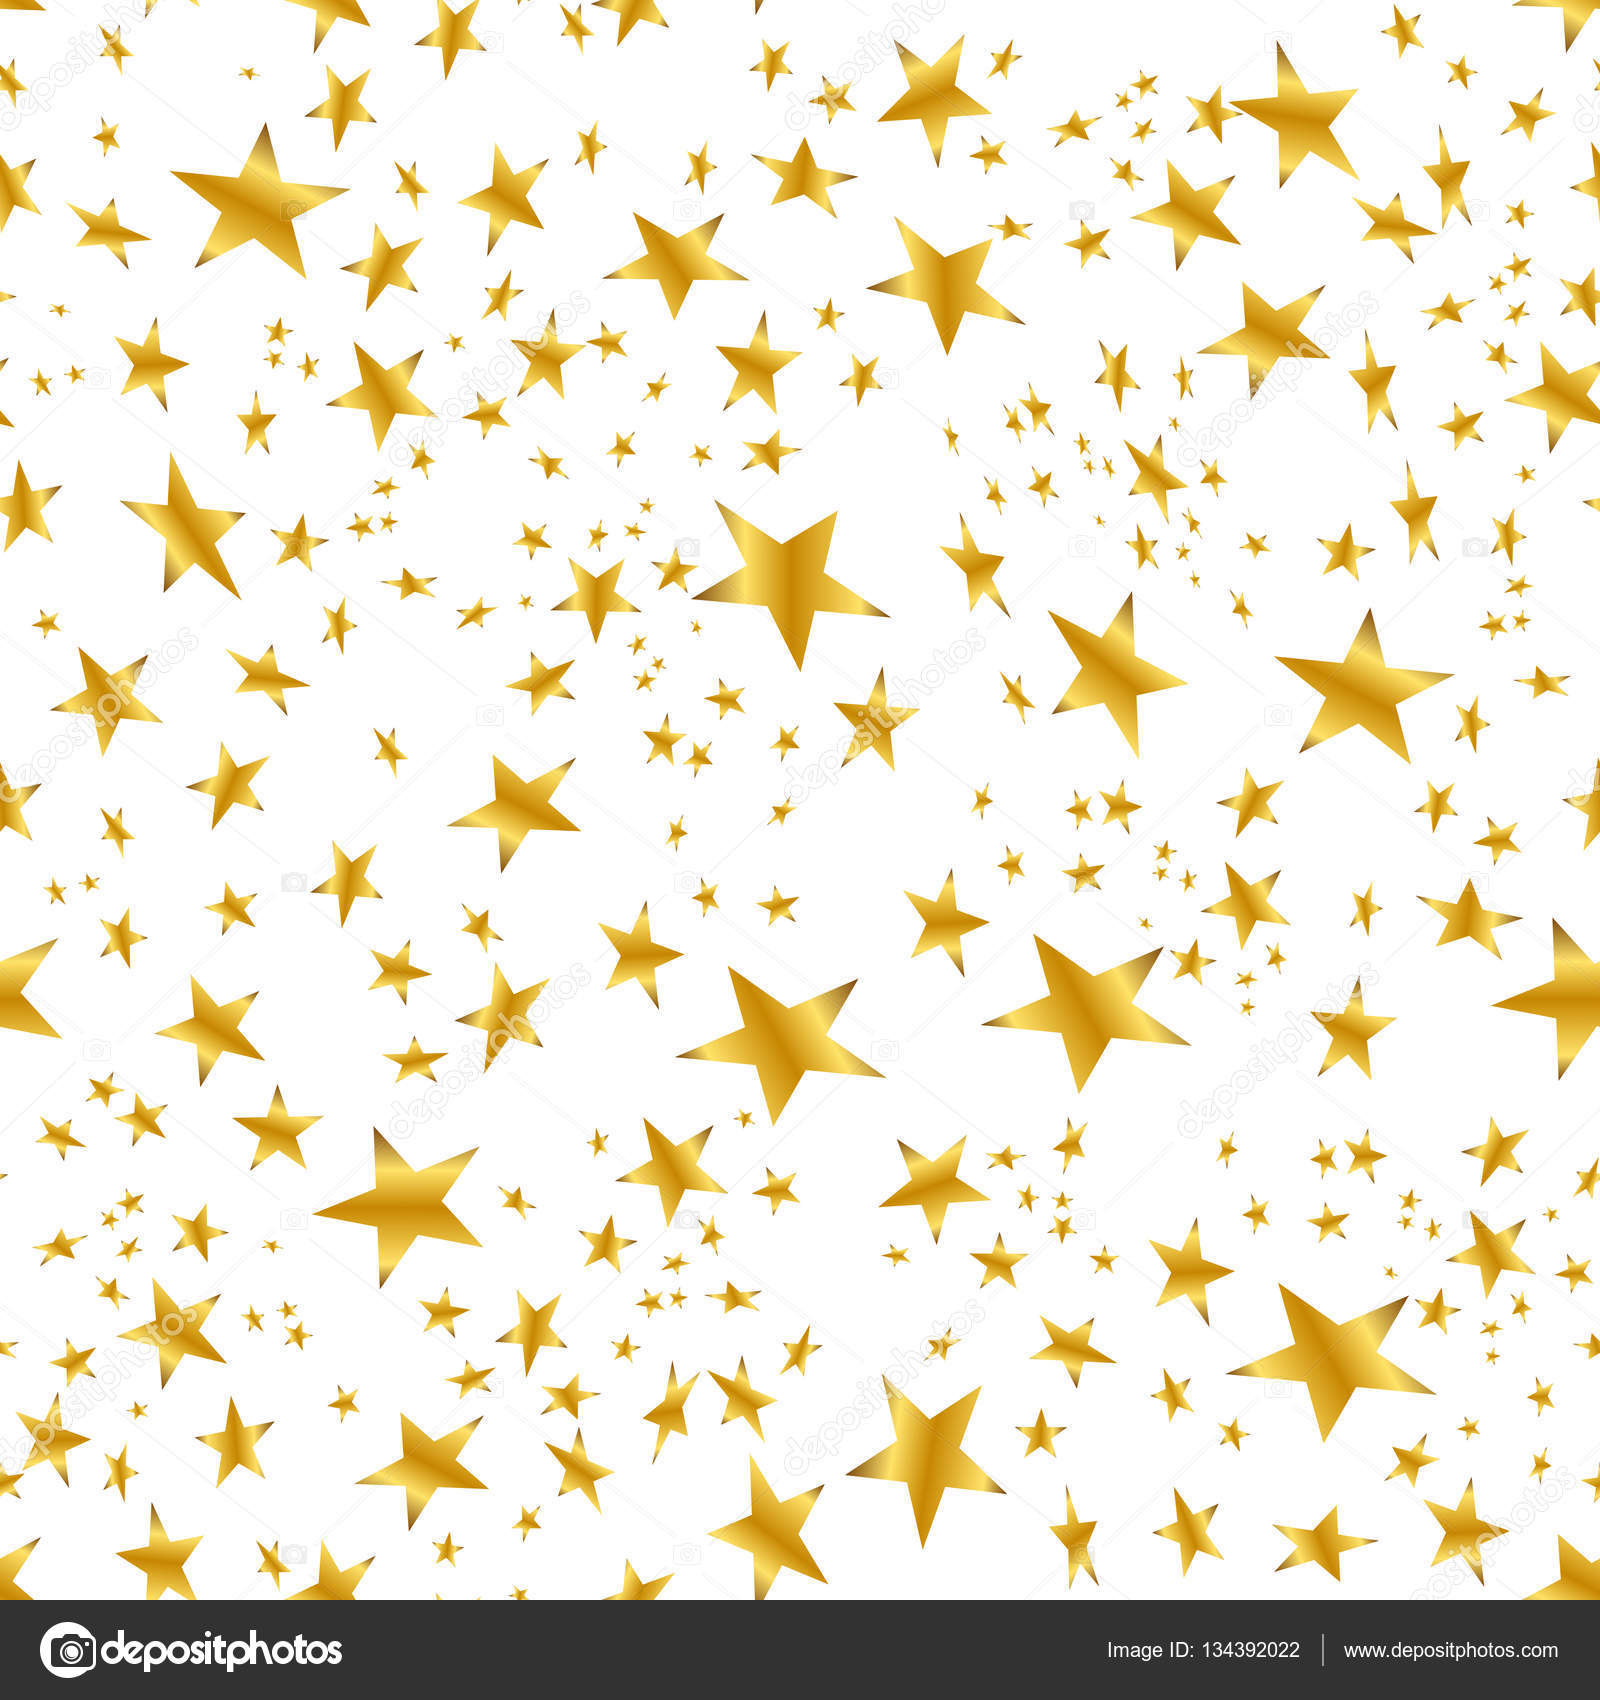 Falling Stars Live Wallpaper Gold Star Confetti Pattern White Background Stock Vector